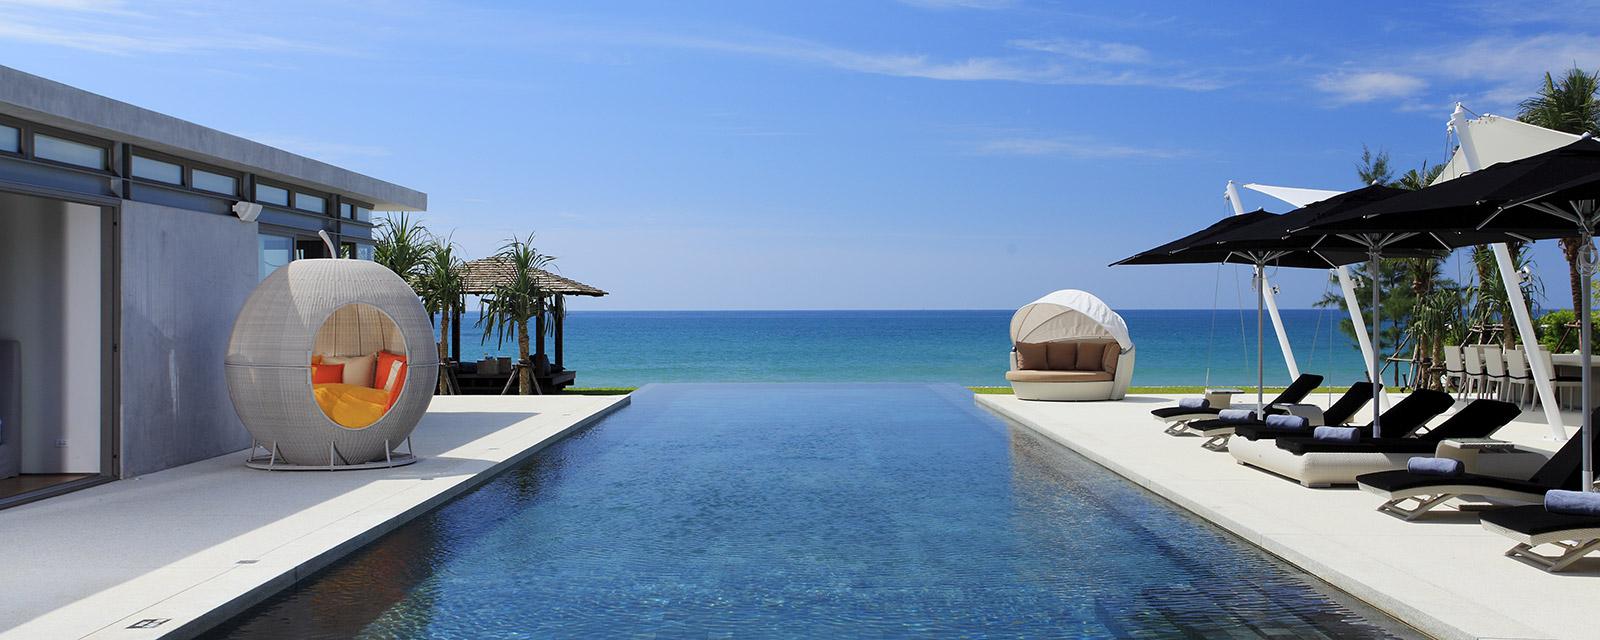 villa tievoli phuket natai beach bei landmark mieten. Black Bedroom Furniture Sets. Home Design Ideas